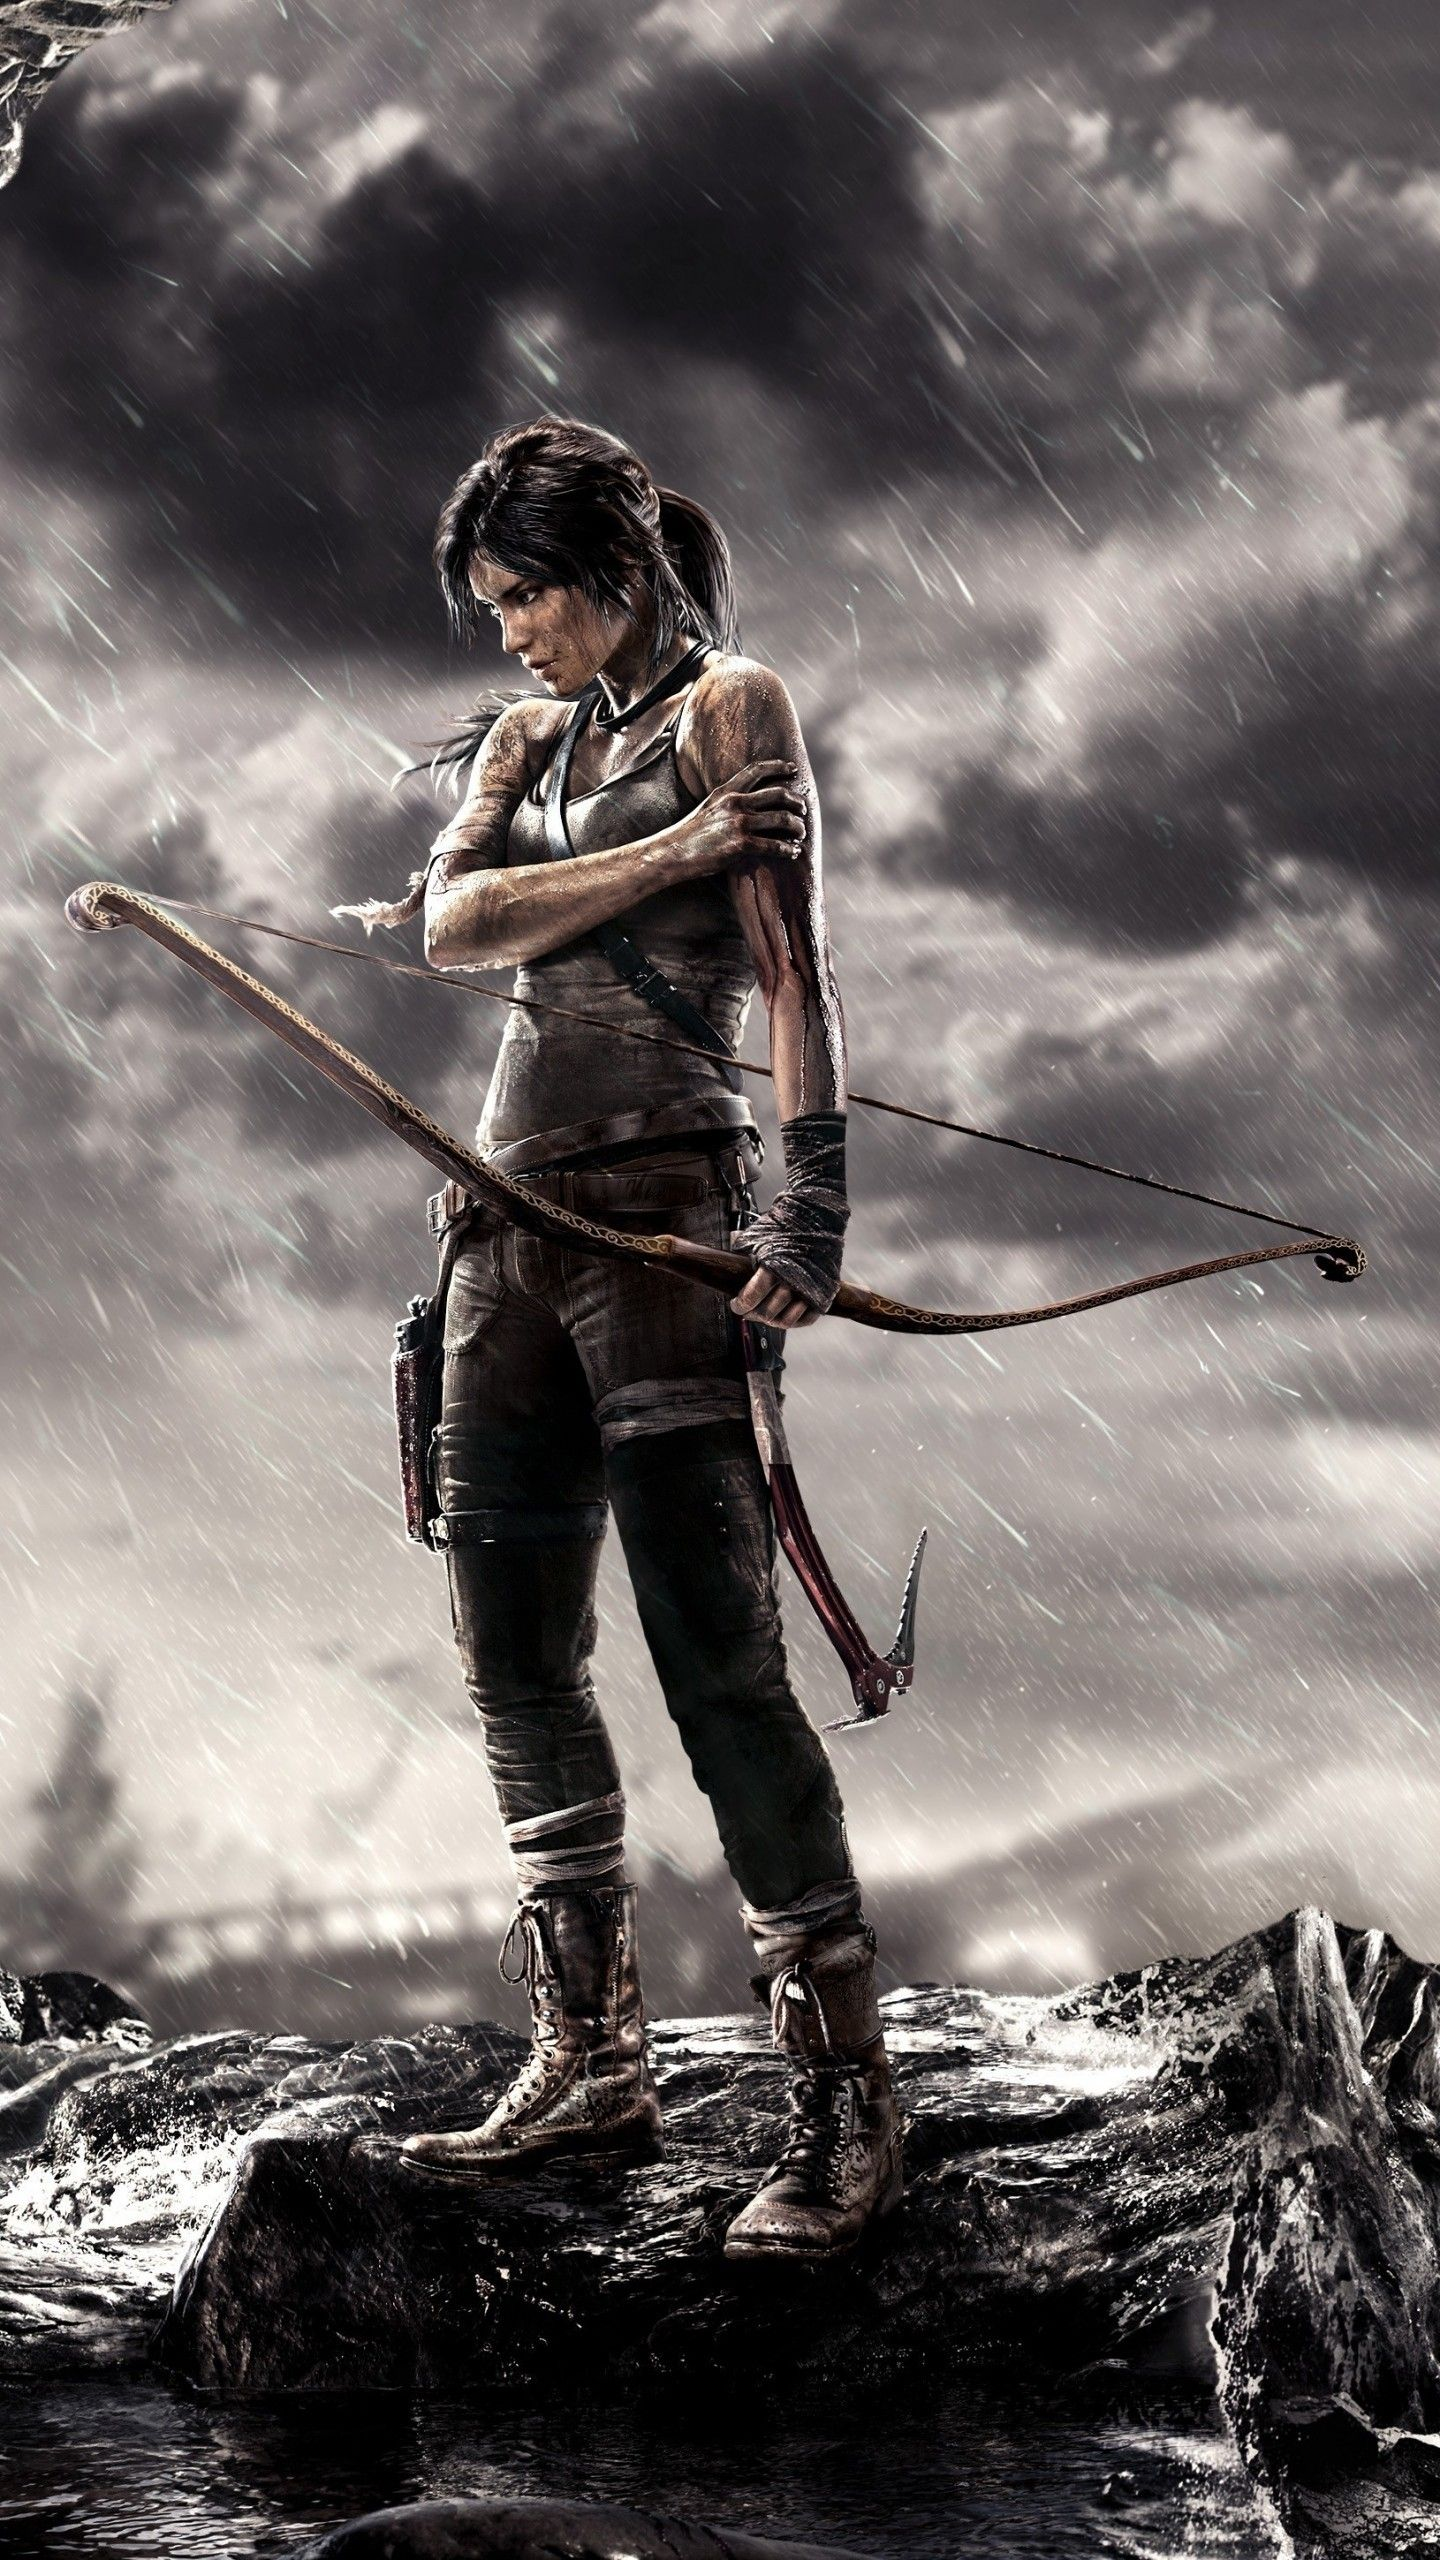 Tomb Raider 4K Wallpapers - Top Free Tomb Raider 4K ...